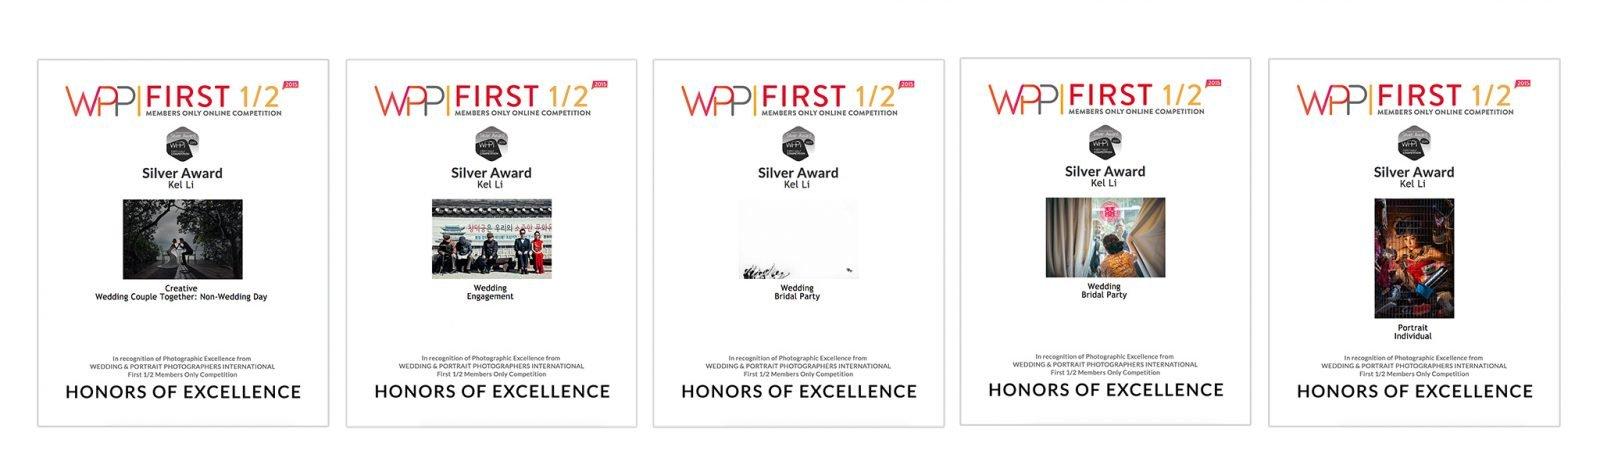 WPPI婚紗攝影獲獎作品